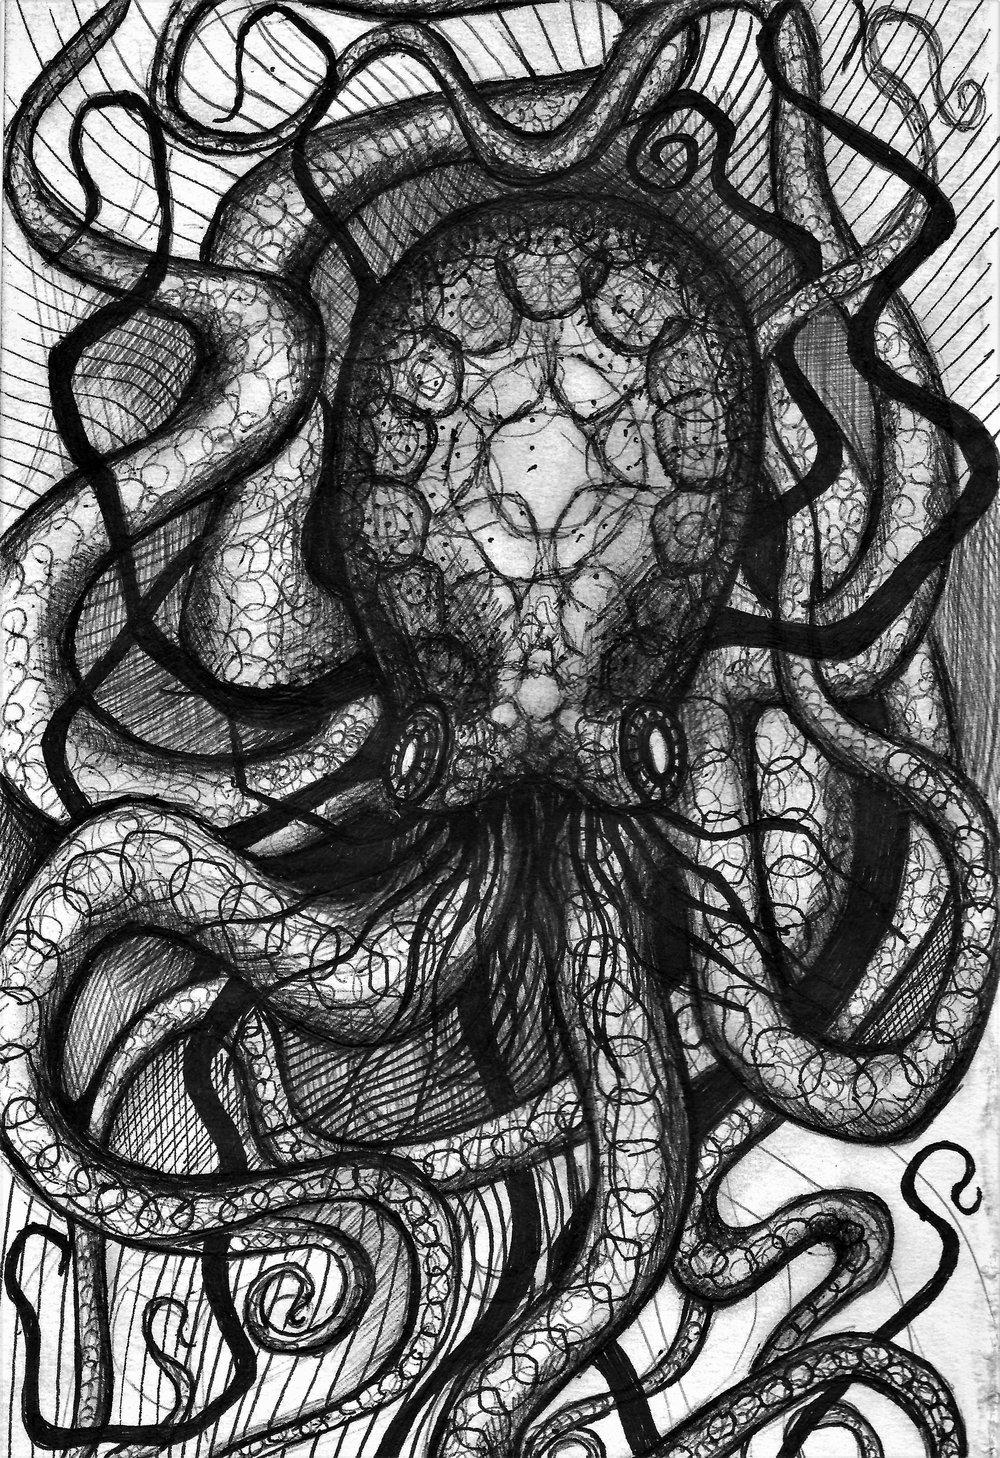 (Octopus) pen on paper